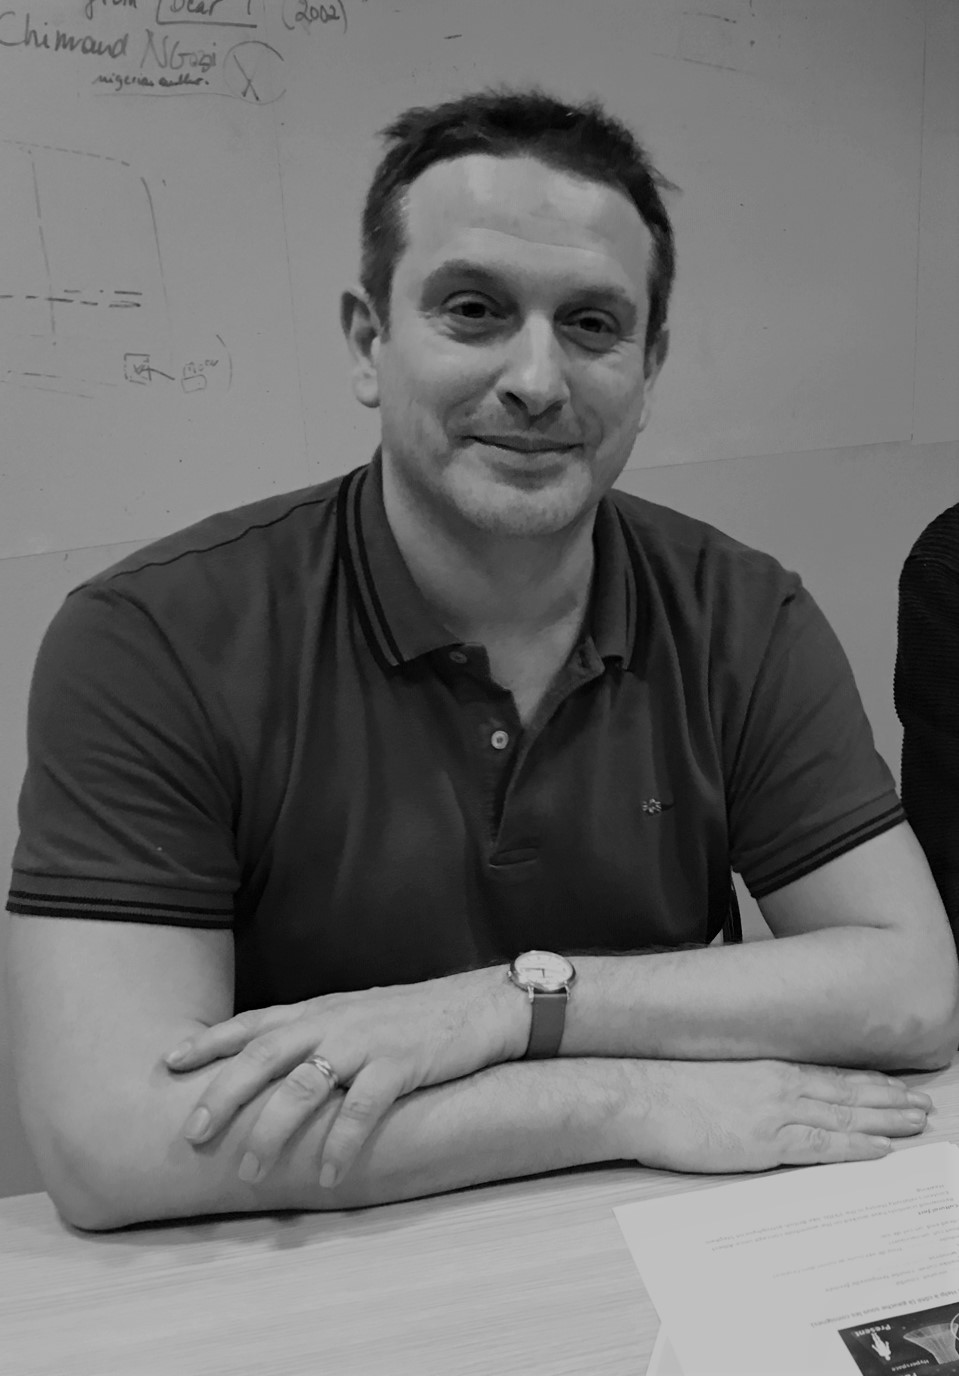 Manuel Jobert